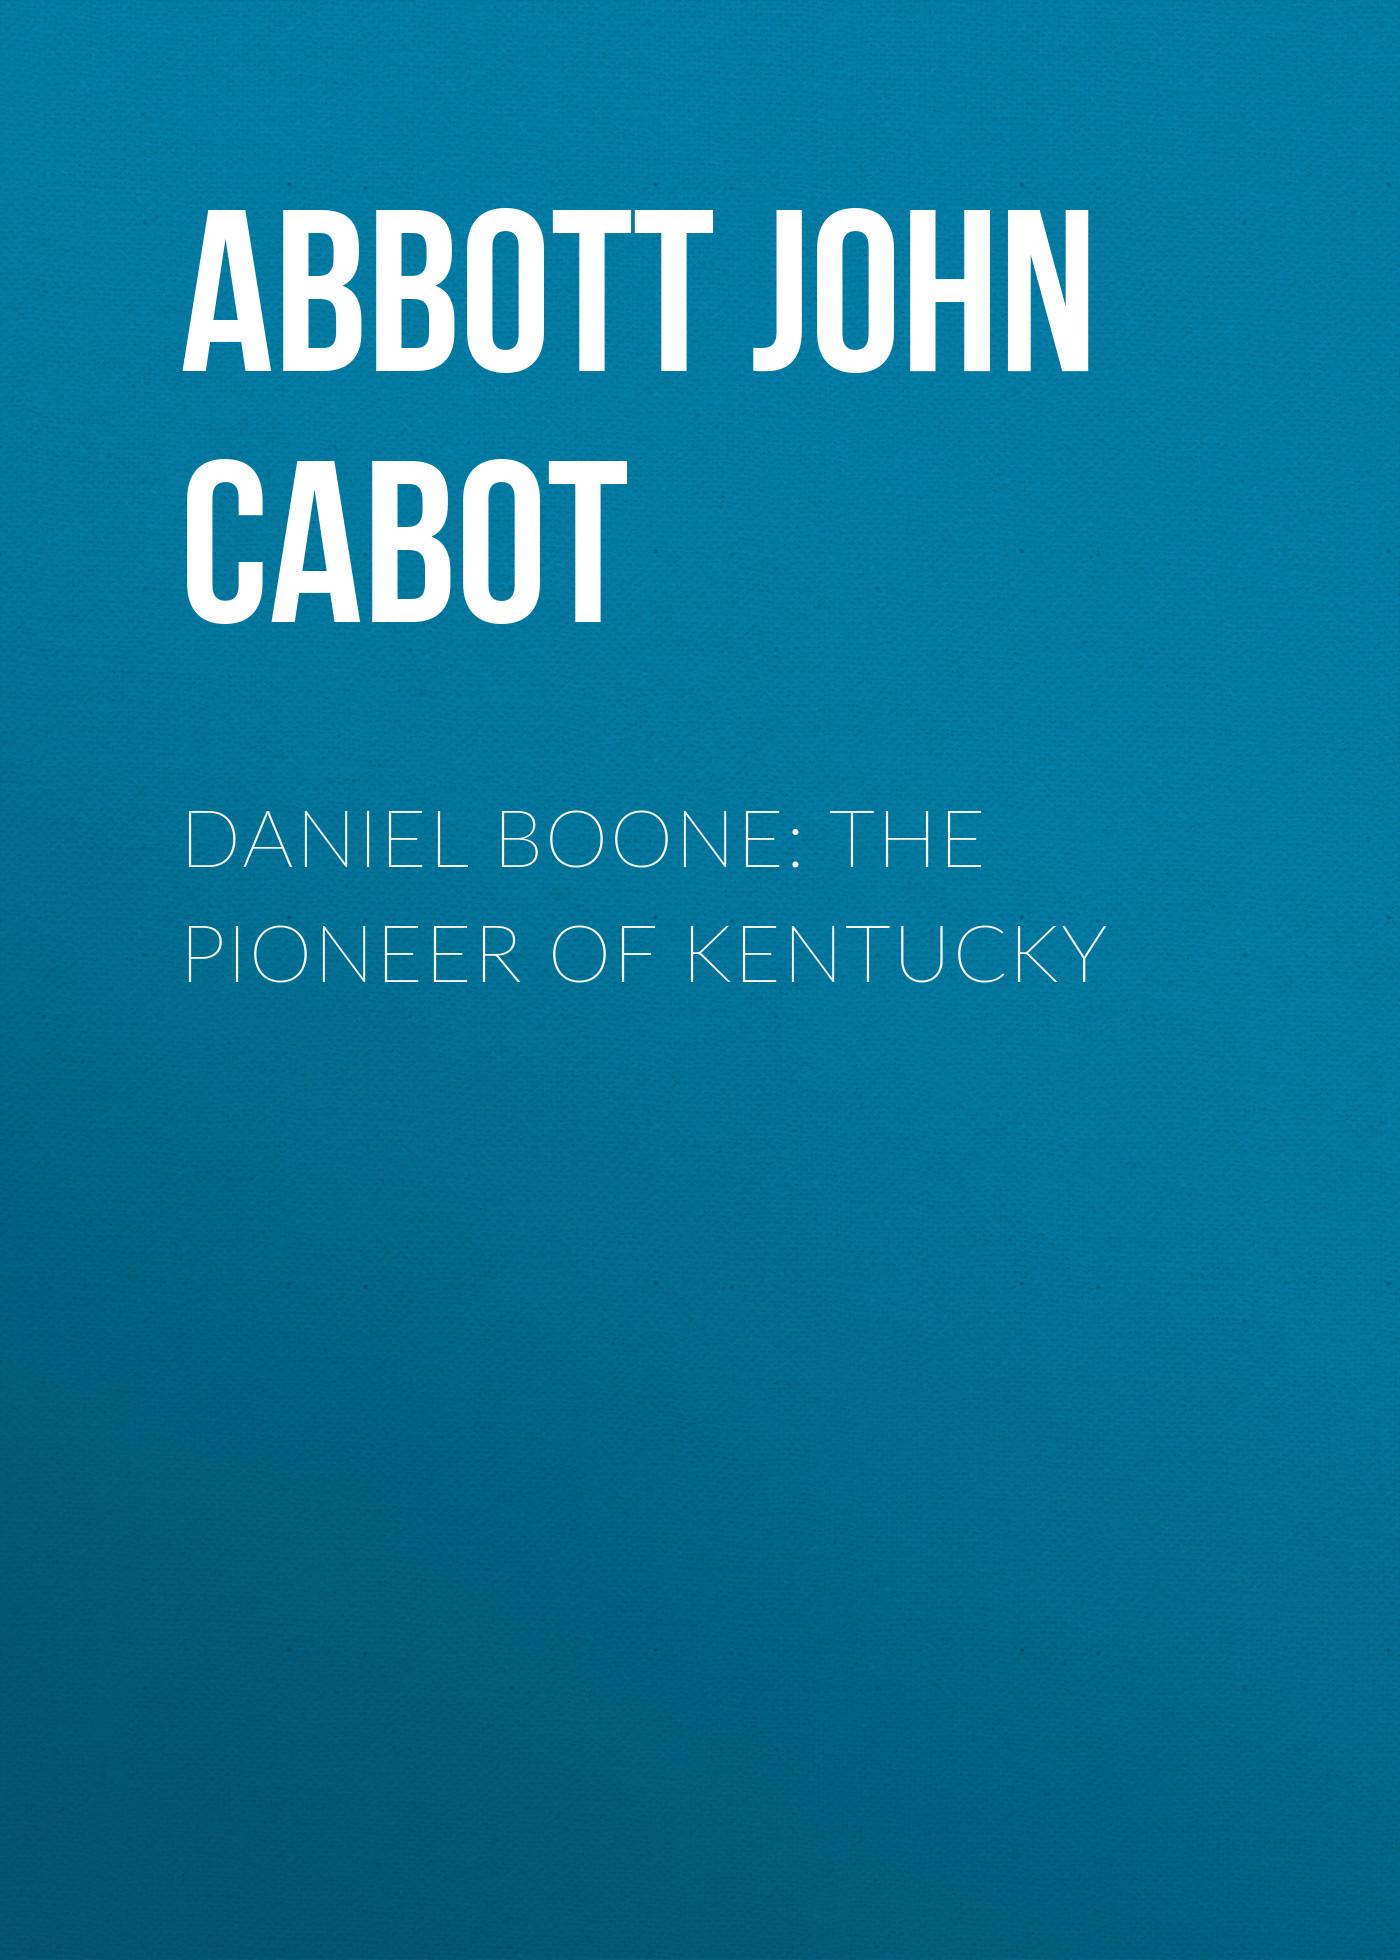 Abbott John Stevens Cabot, Daniel Boone: The Pioneer of Kentucky ...